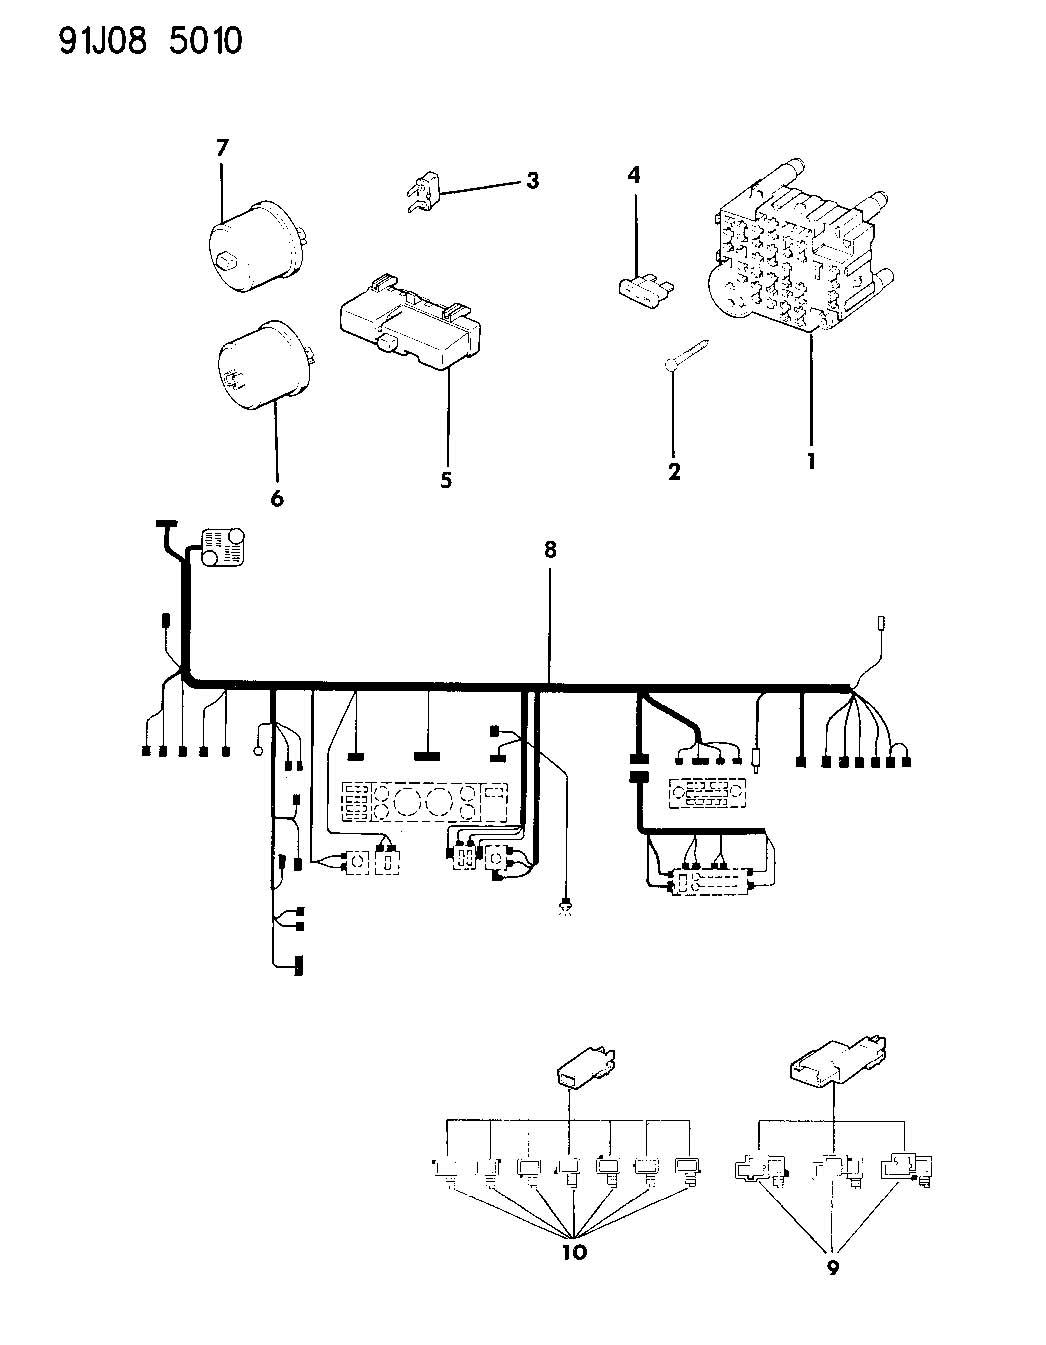 Lightning Amp Wiring Diagram Auto Electrical Control Actuator 4 Atc Fuse